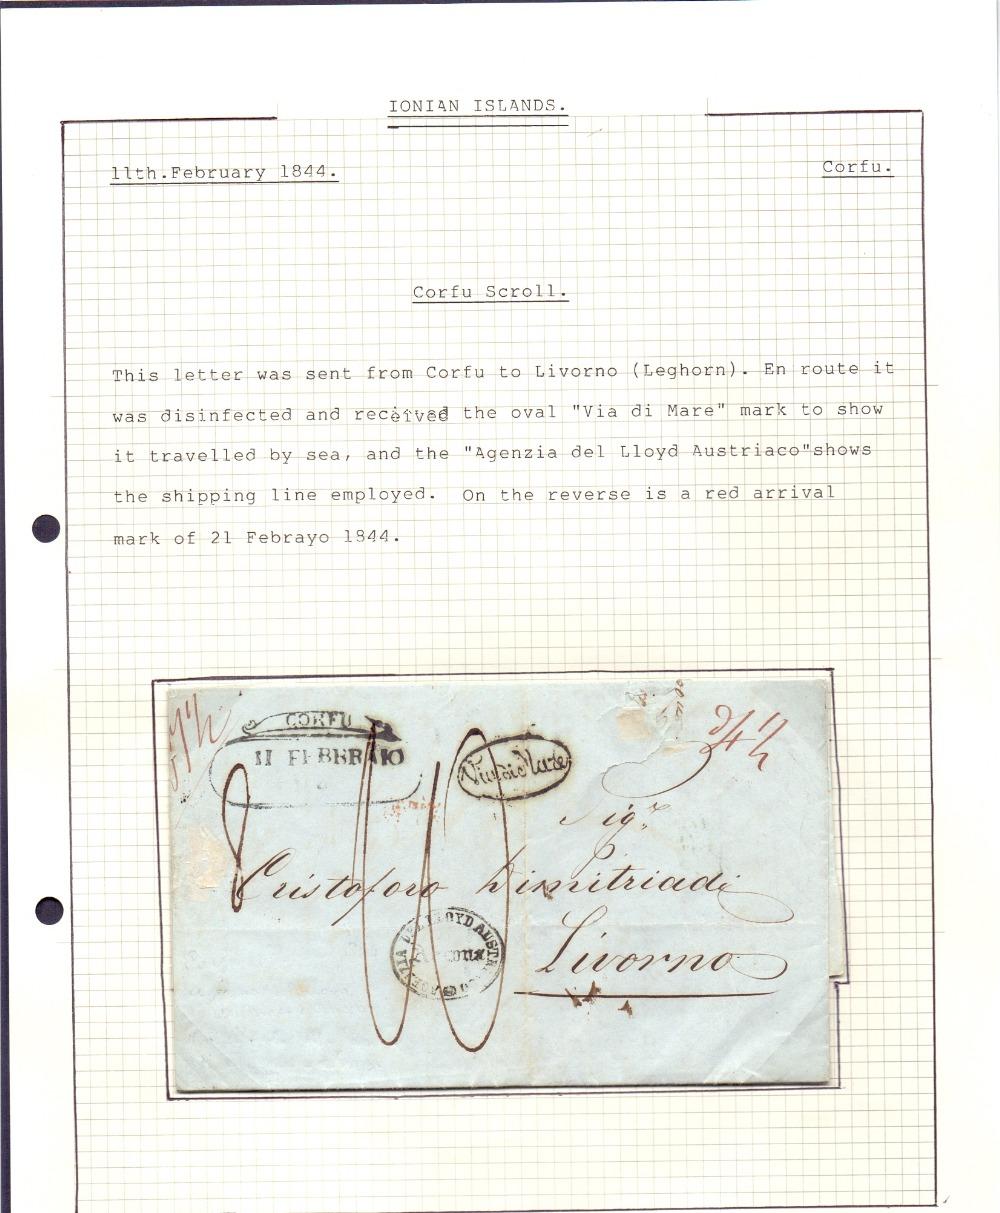 Lot 51 - Postal History : IONIAN ISLANDS, 1844 en